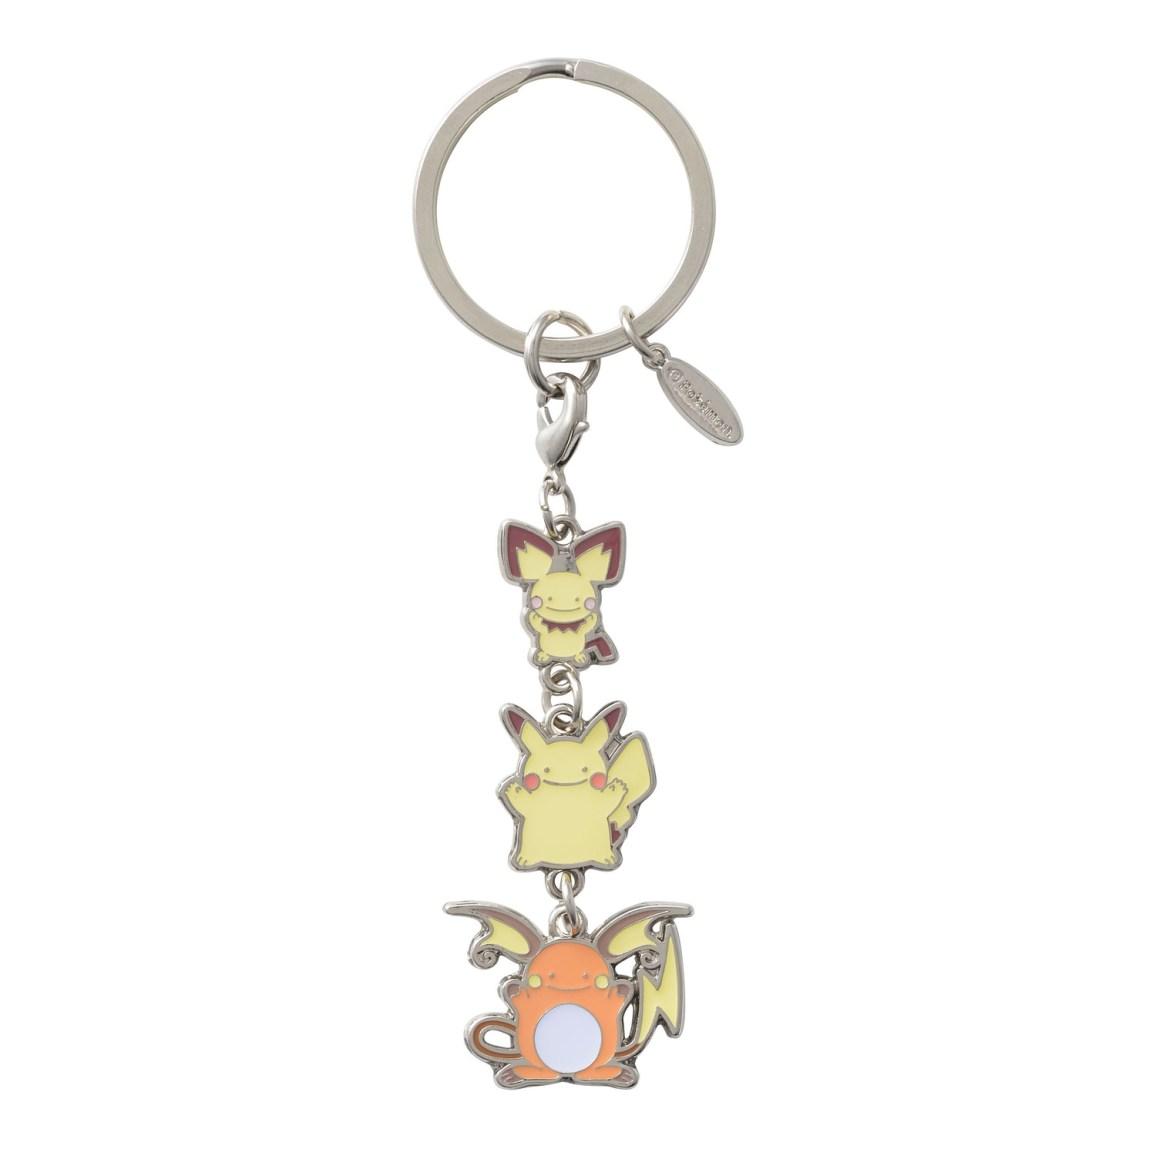 ditto-transform-keychain-3-hq-01